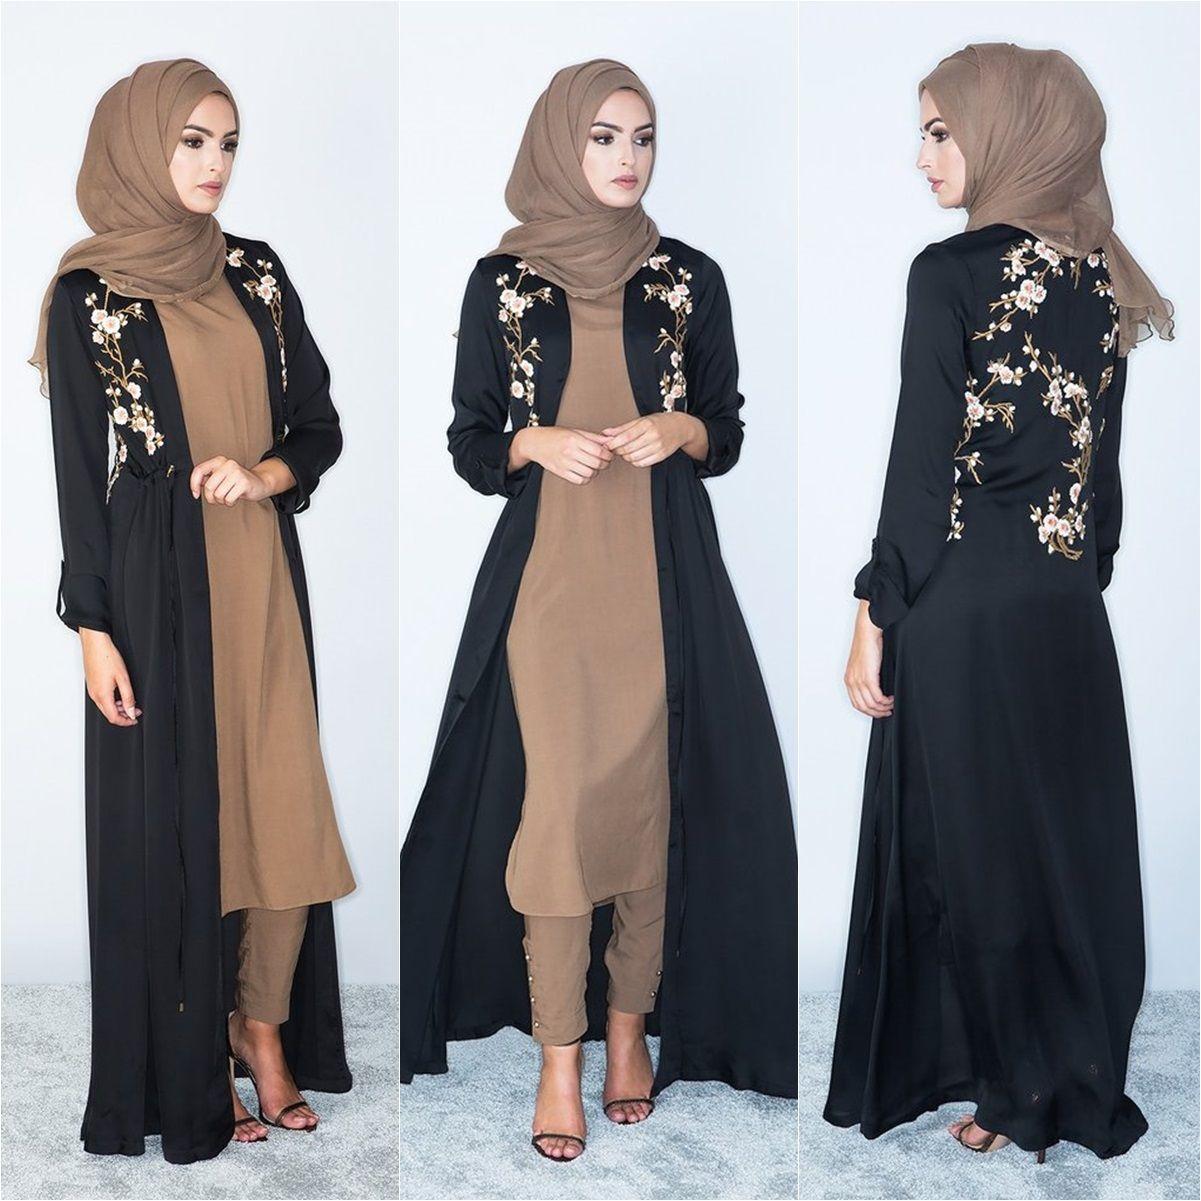 51bcfea7f1463 Beautiful Kimonos By Aab Collections | Hijab Fashion | Hijab fashion ...